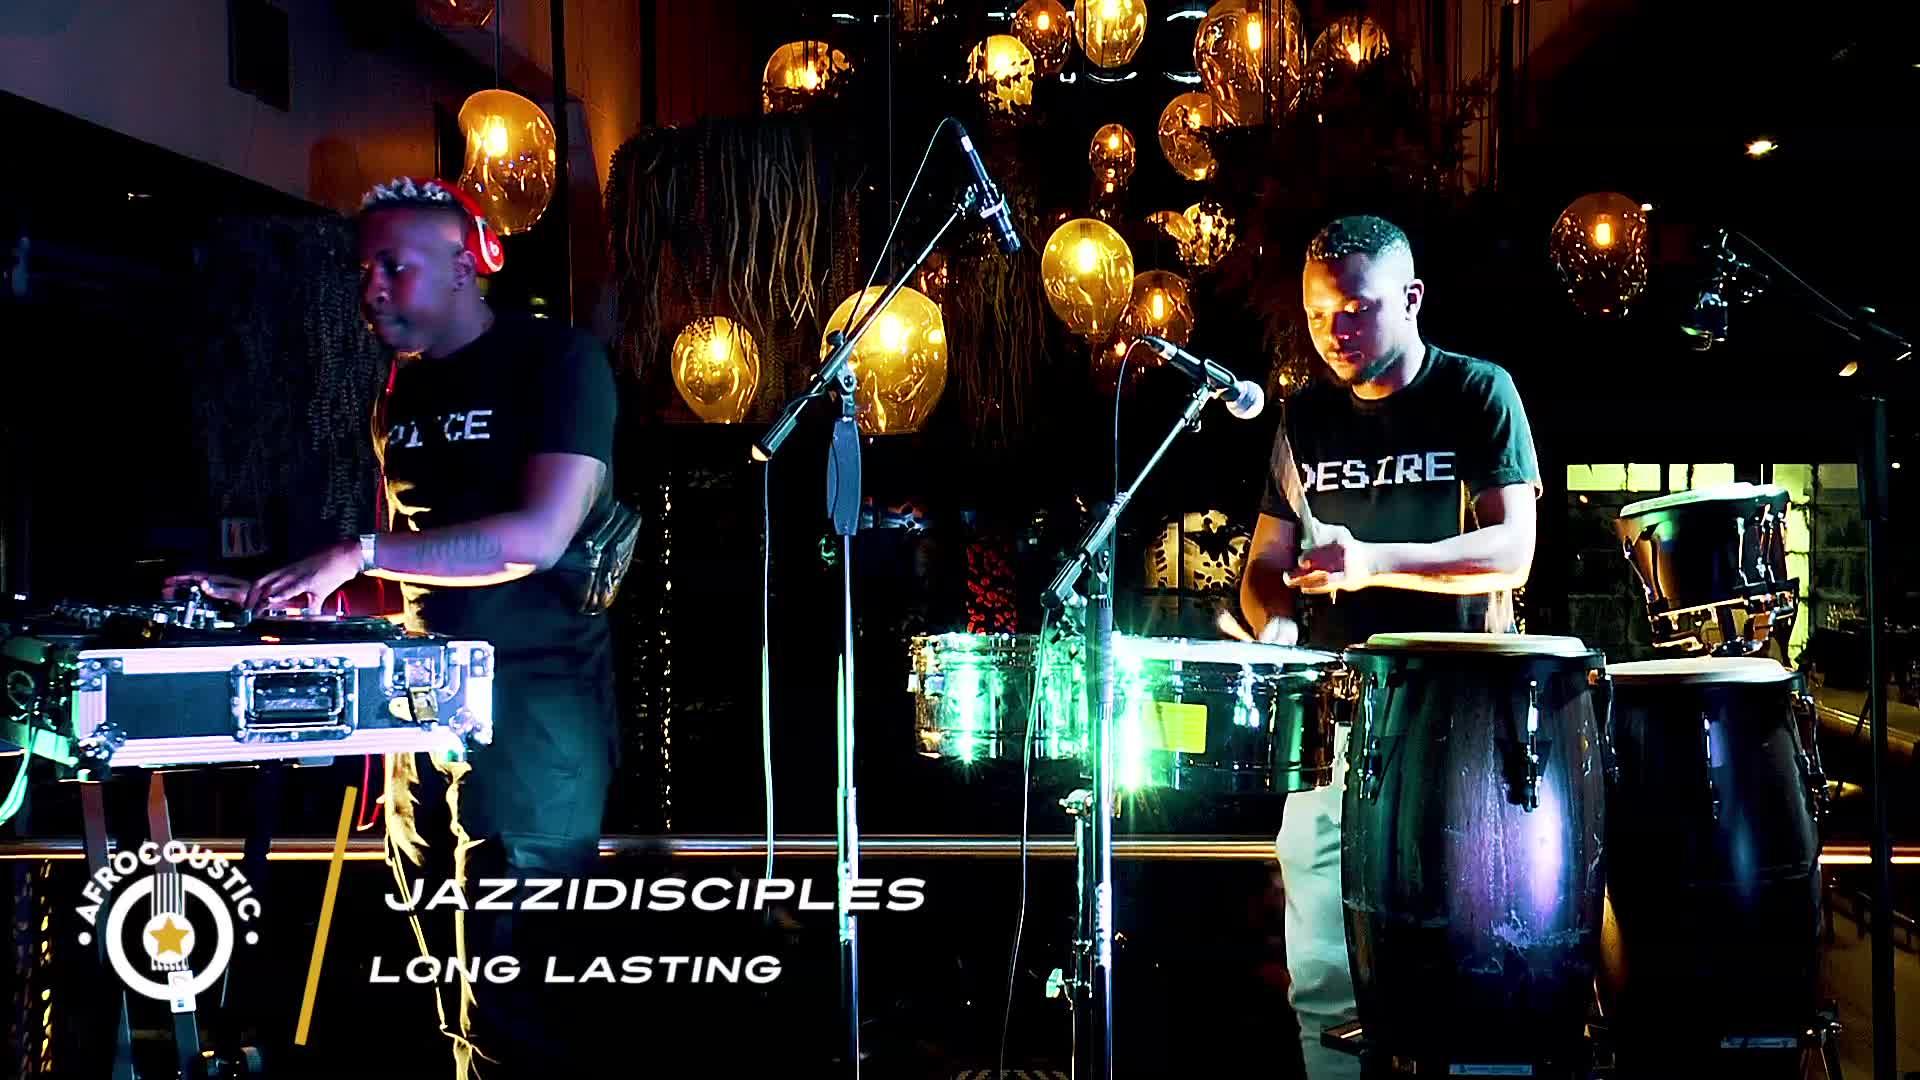 Afrocoustic JazziDisciples - Long Lasting